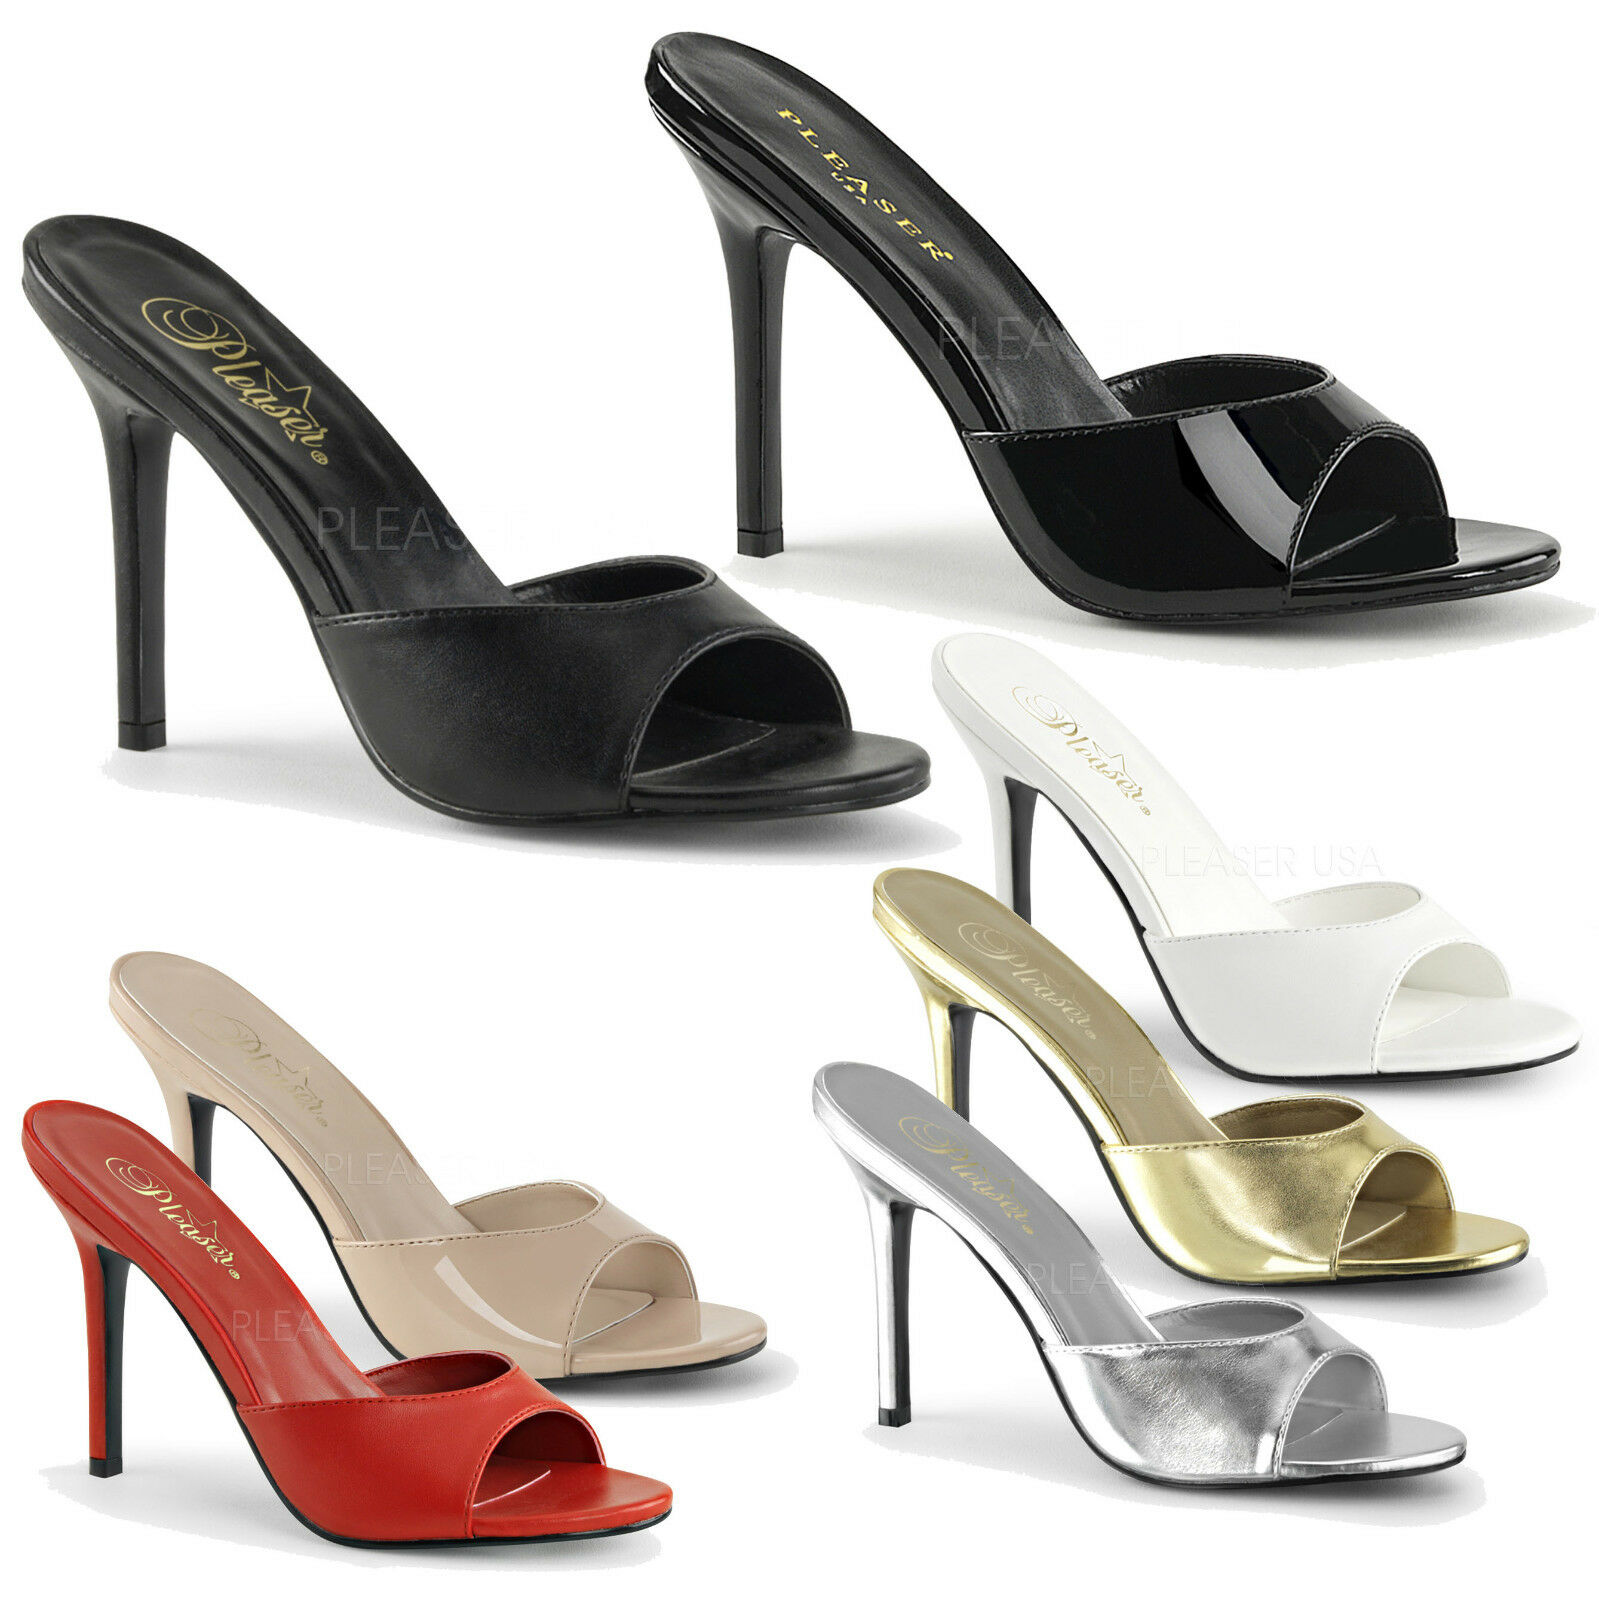 PLEASER - Classique-01 Heel Peep Toe Slide Schuhe Sandale